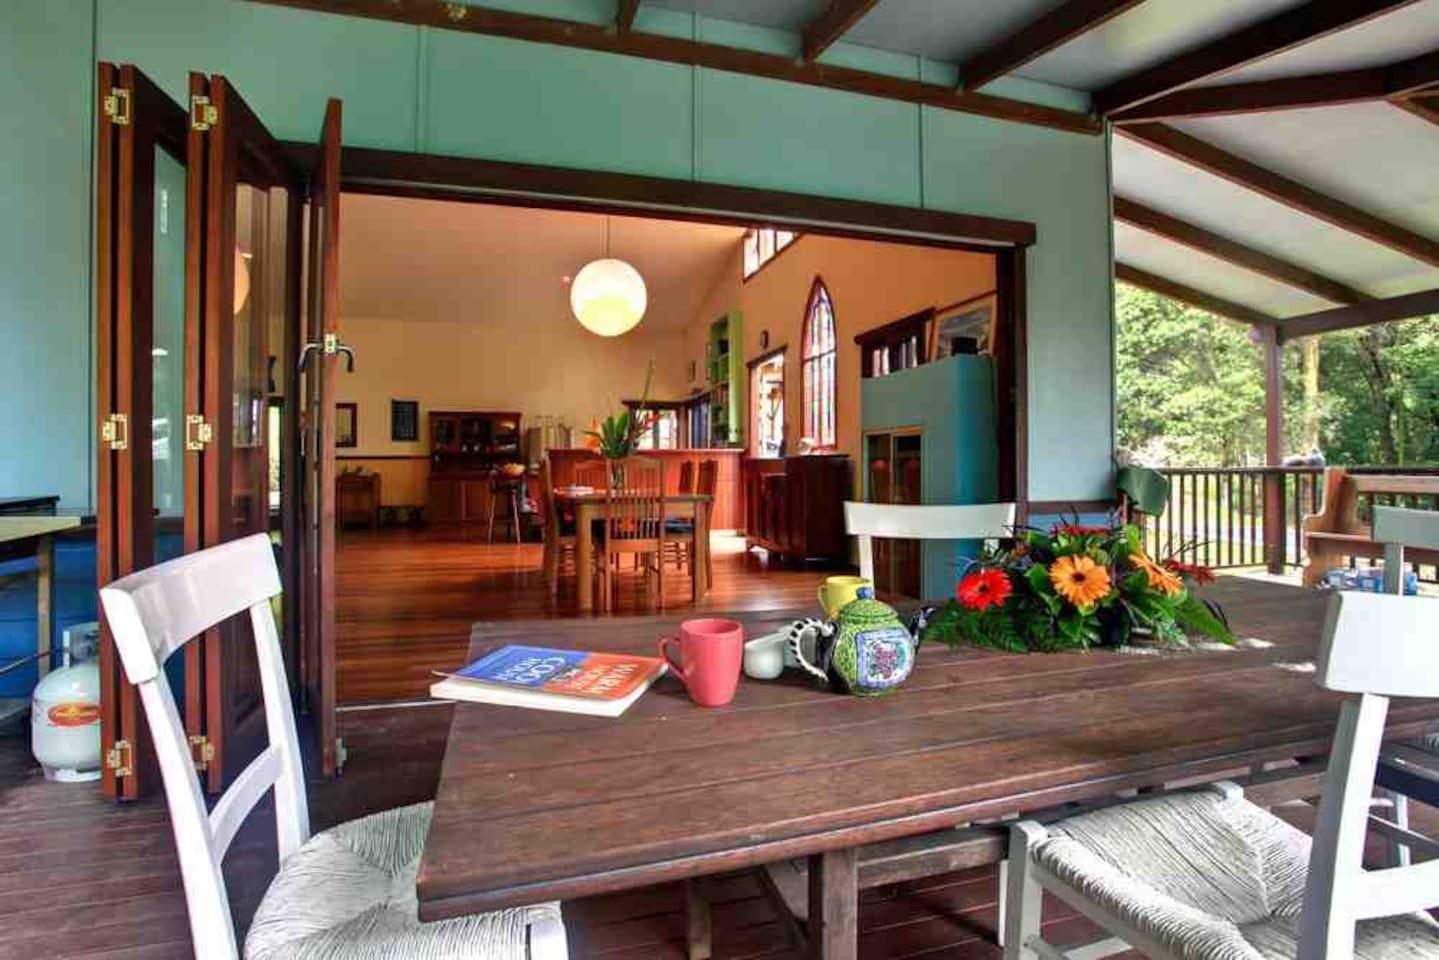 Healing Room - Enjoy a peaceful breakfast listening to the birdsong on the Treehouse verandah…nature's magic! : )